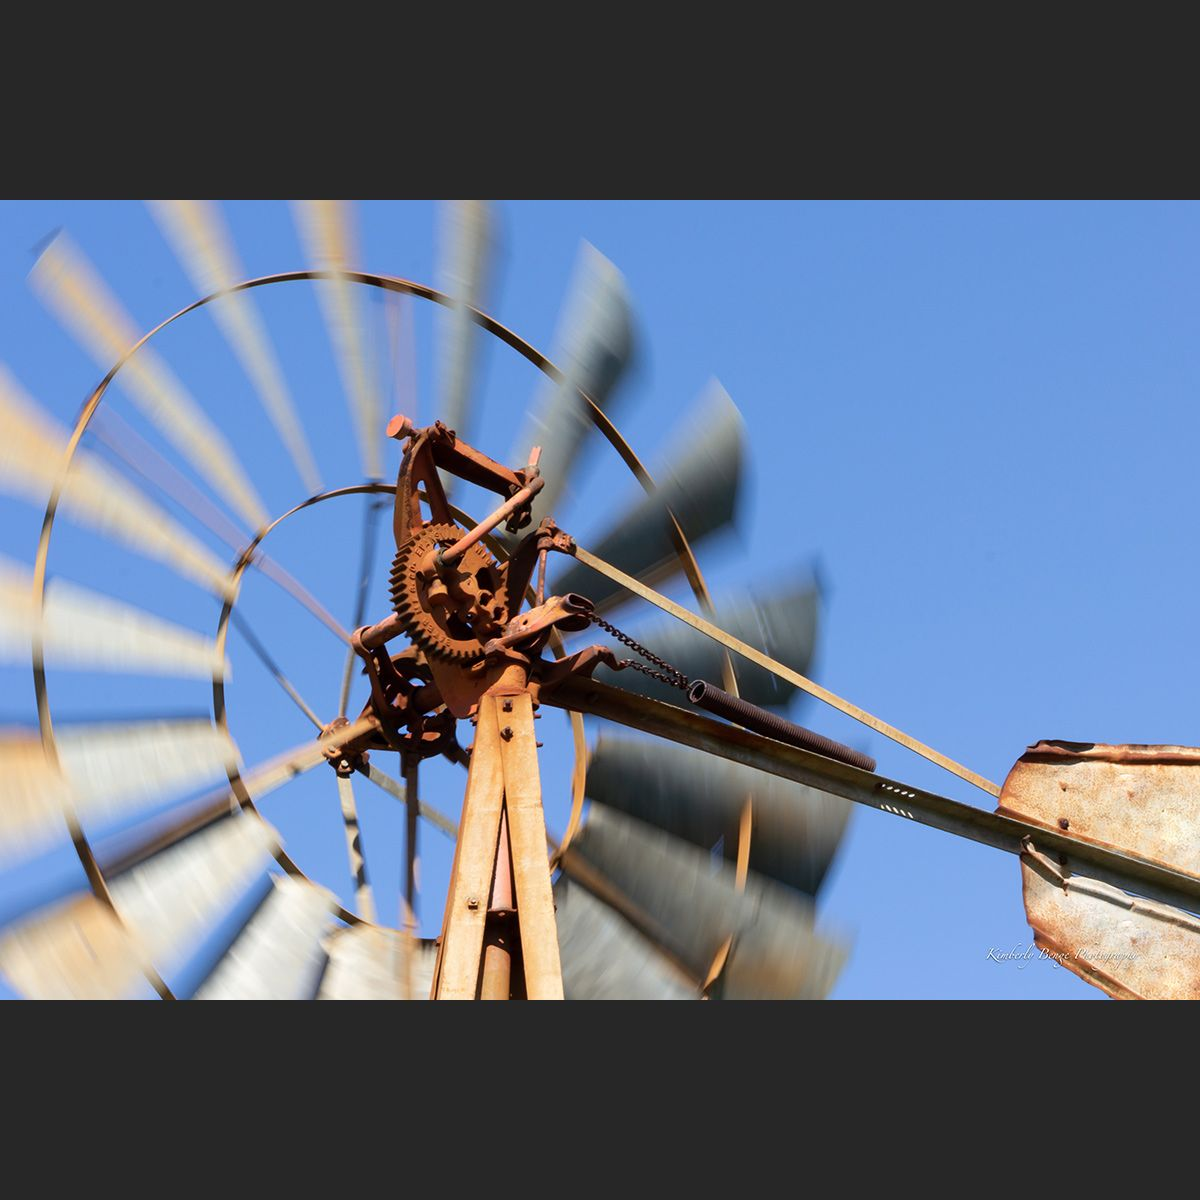 Winds a Turning windmill art